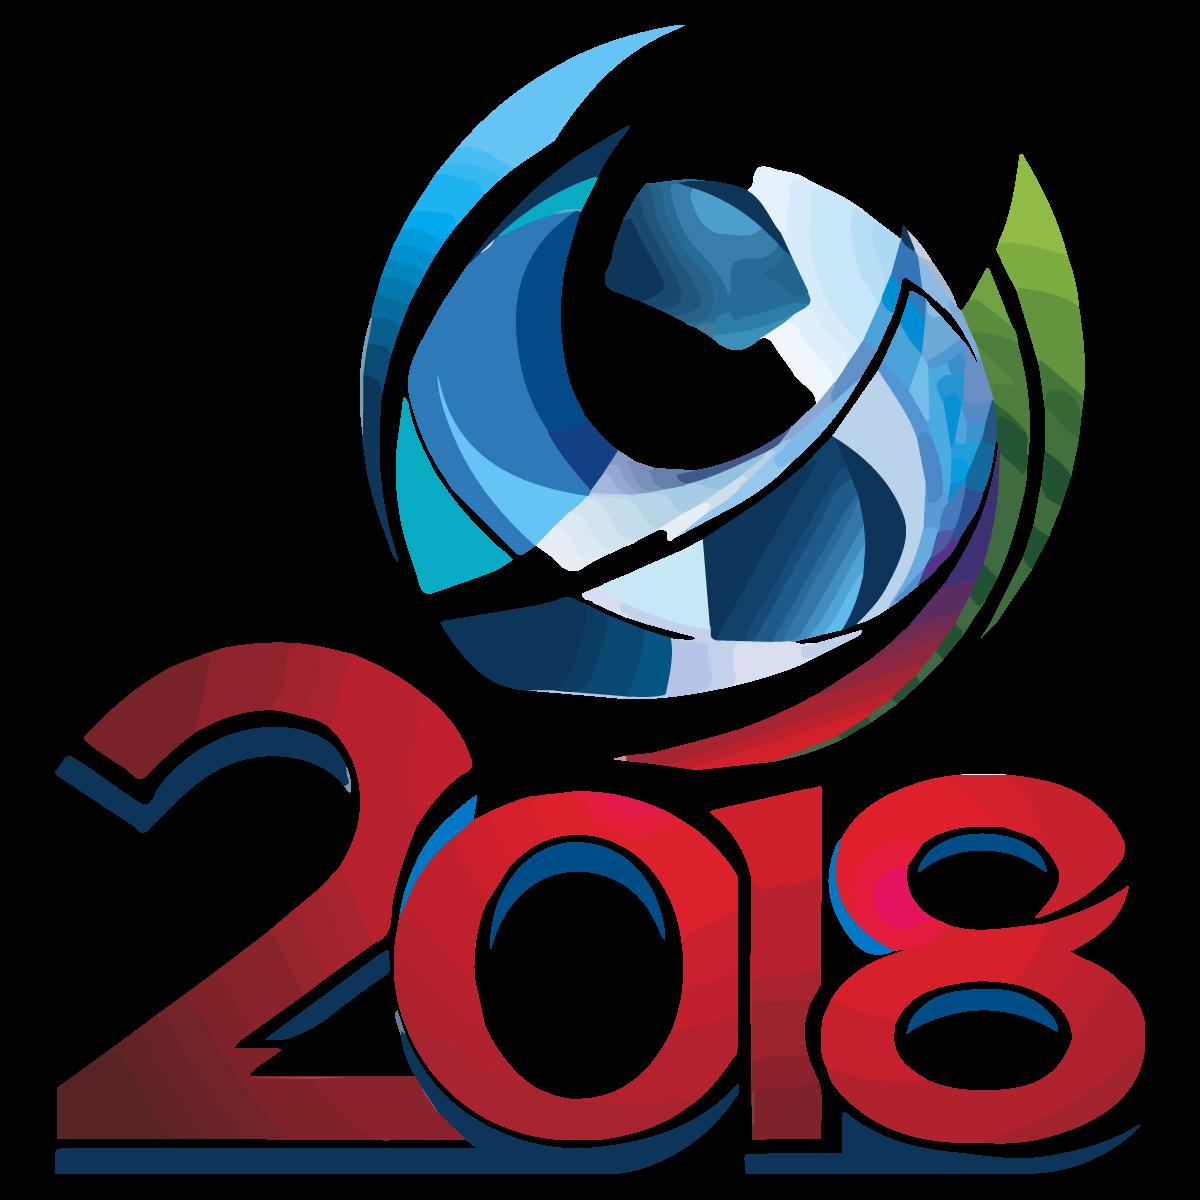 FIFA World Cup Russia 2018 Football Logo Vector.